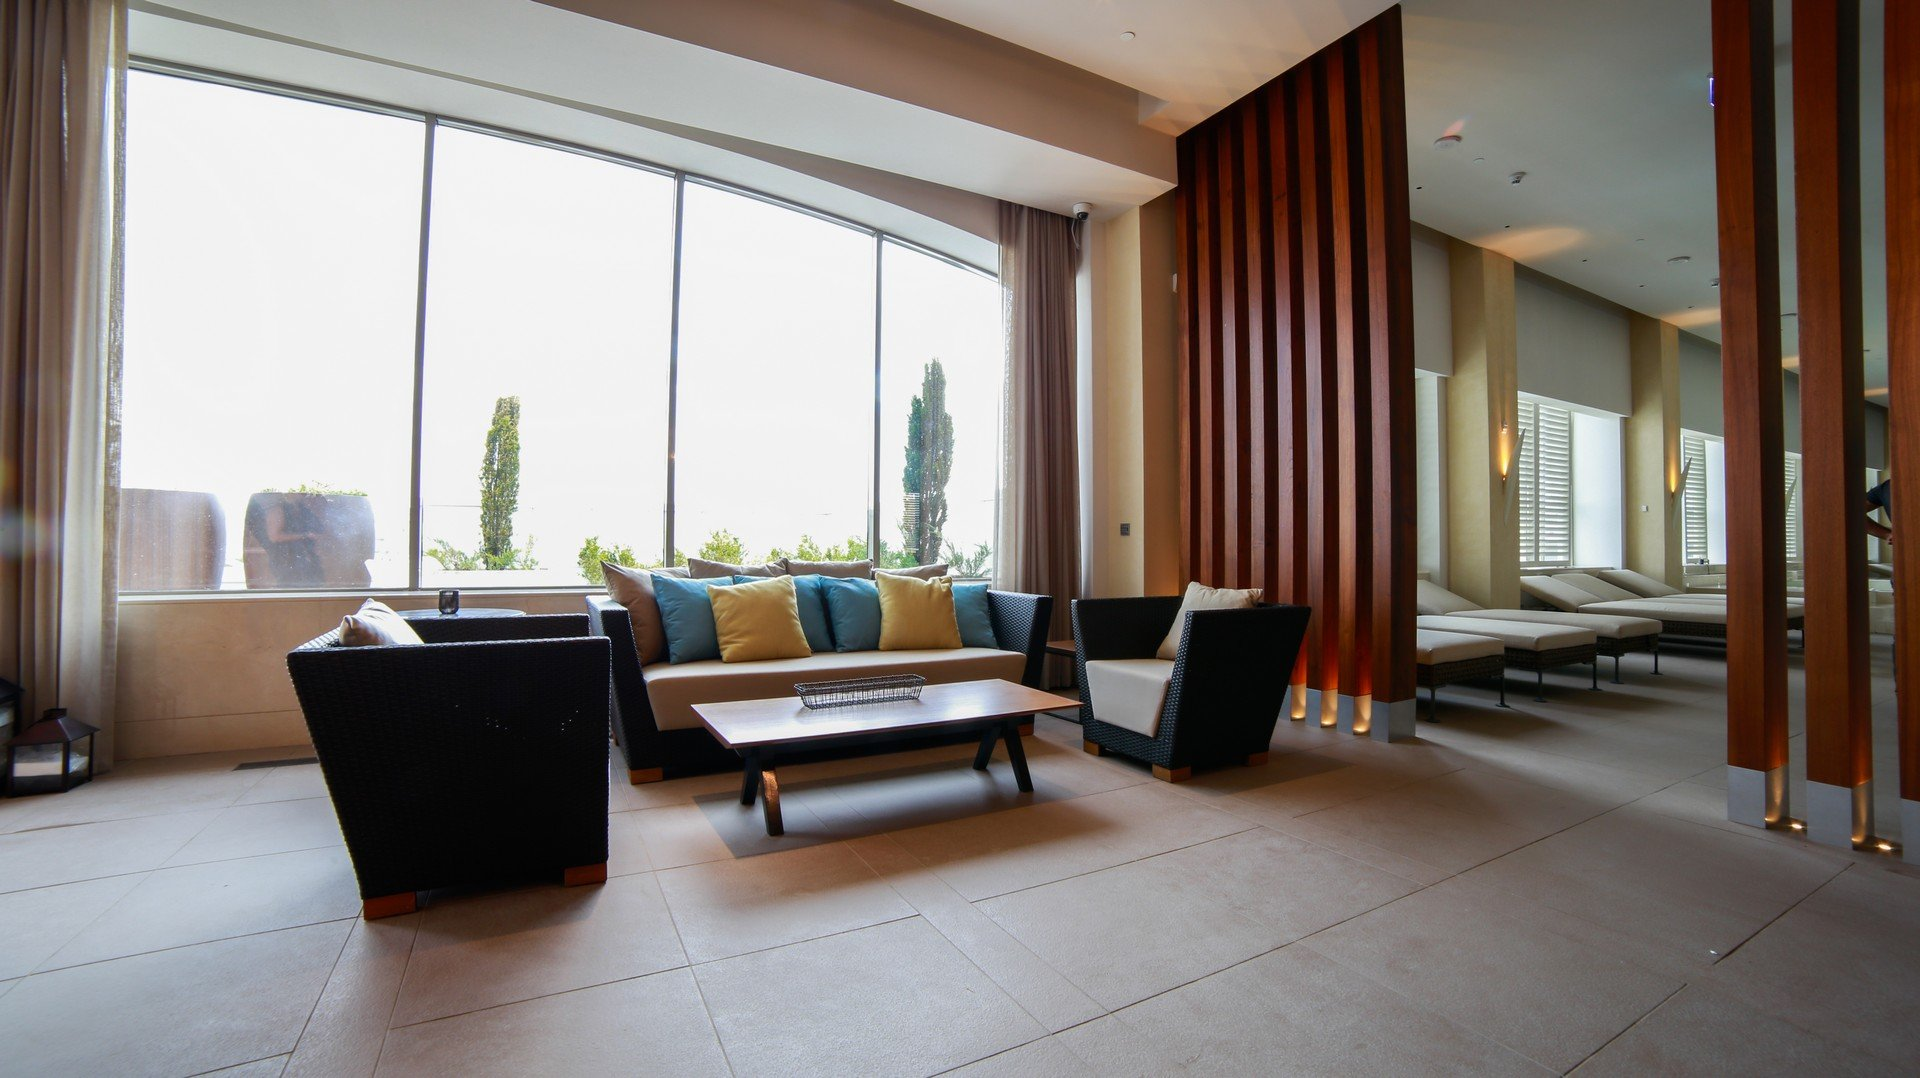 Özbekistan Tashkent HYATT Regency Hotel